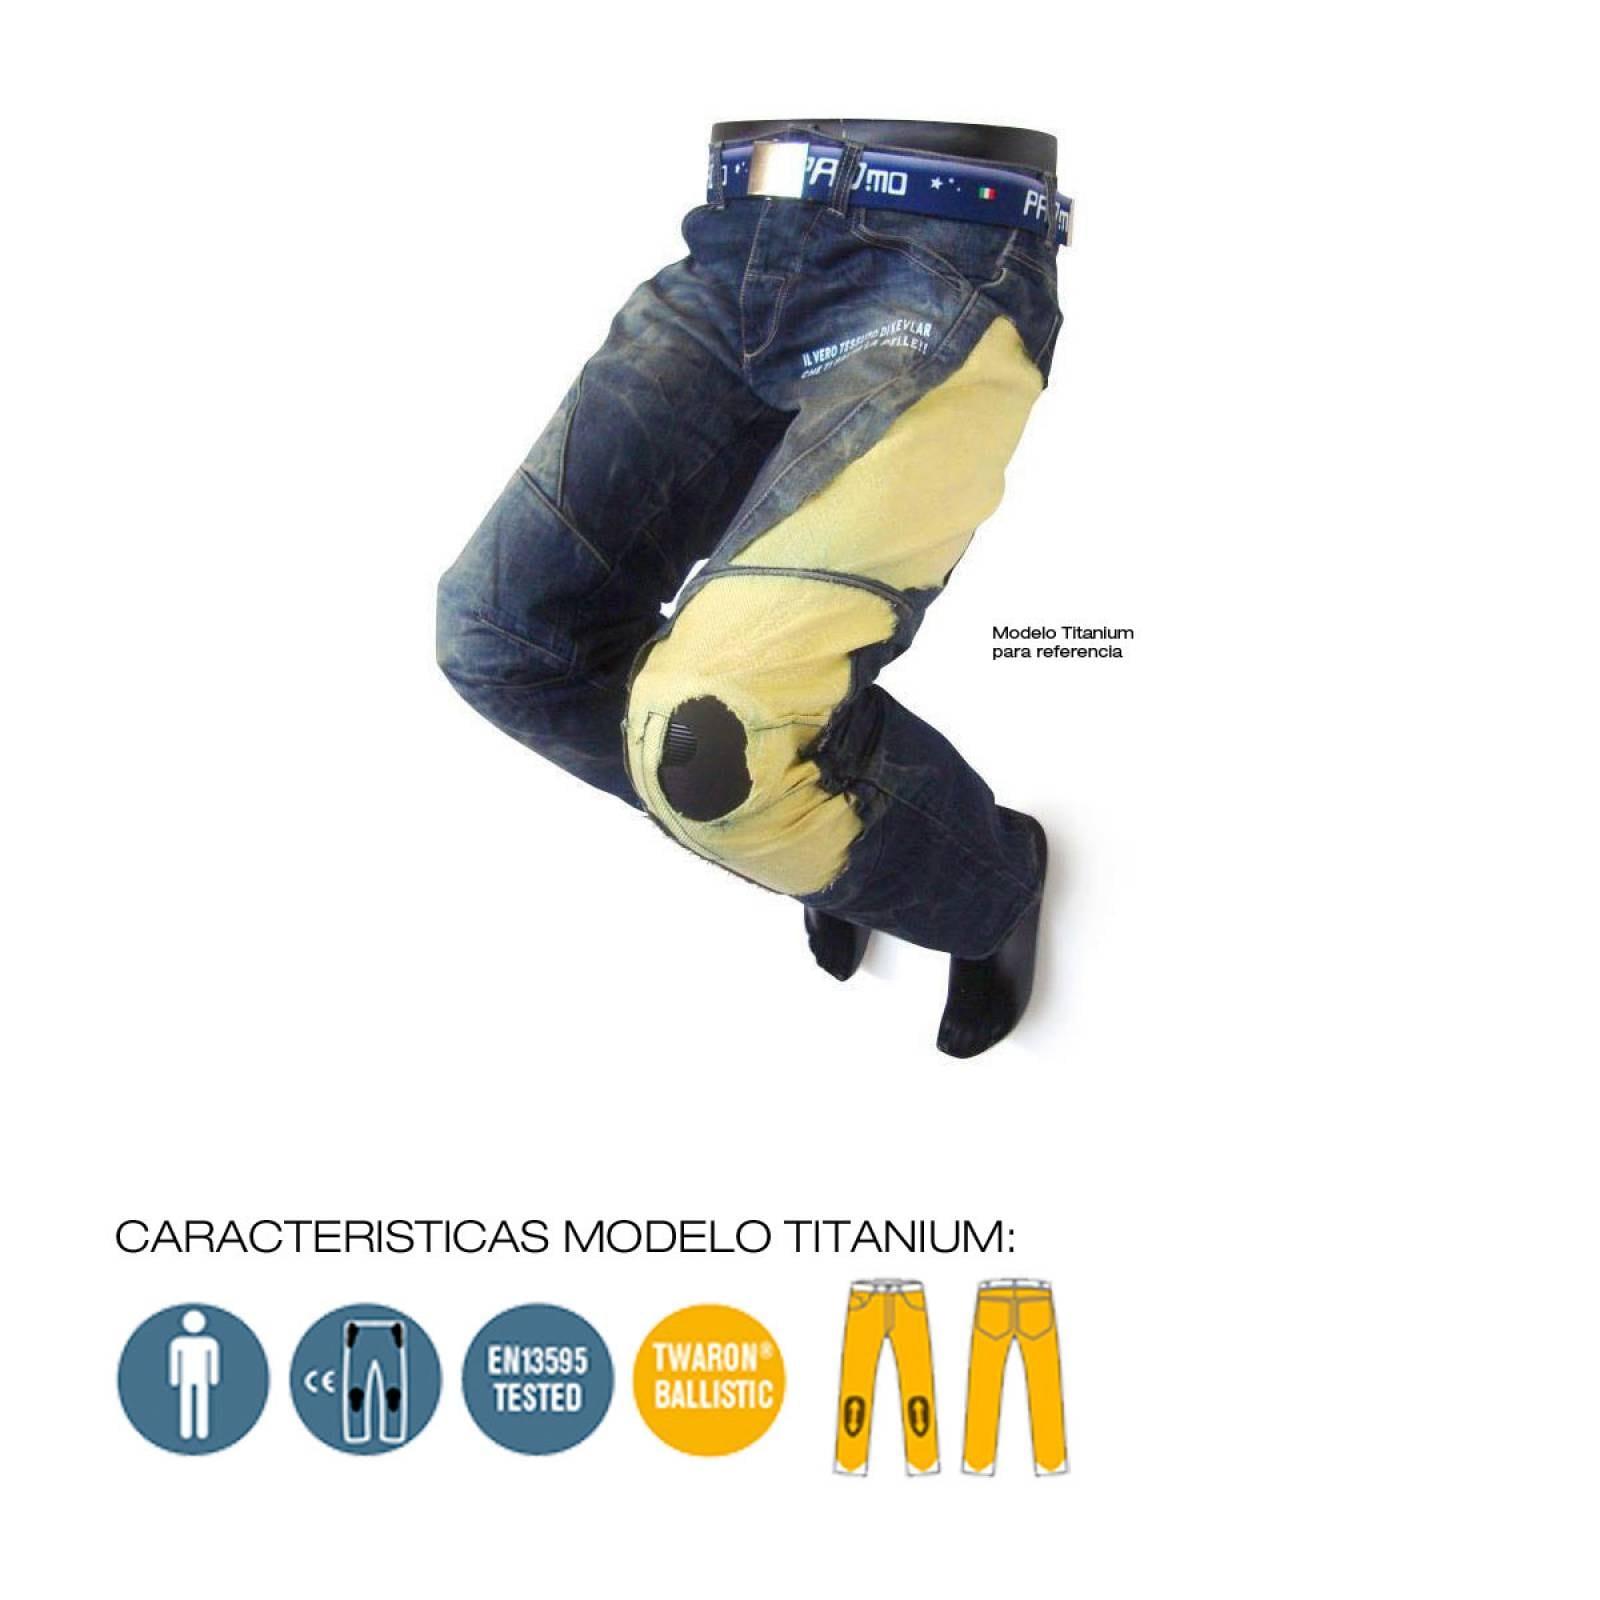 PANTALON ITALIANO PARA MOTOCICLISMO MODELO TITANIUM PMJ EN13595-1